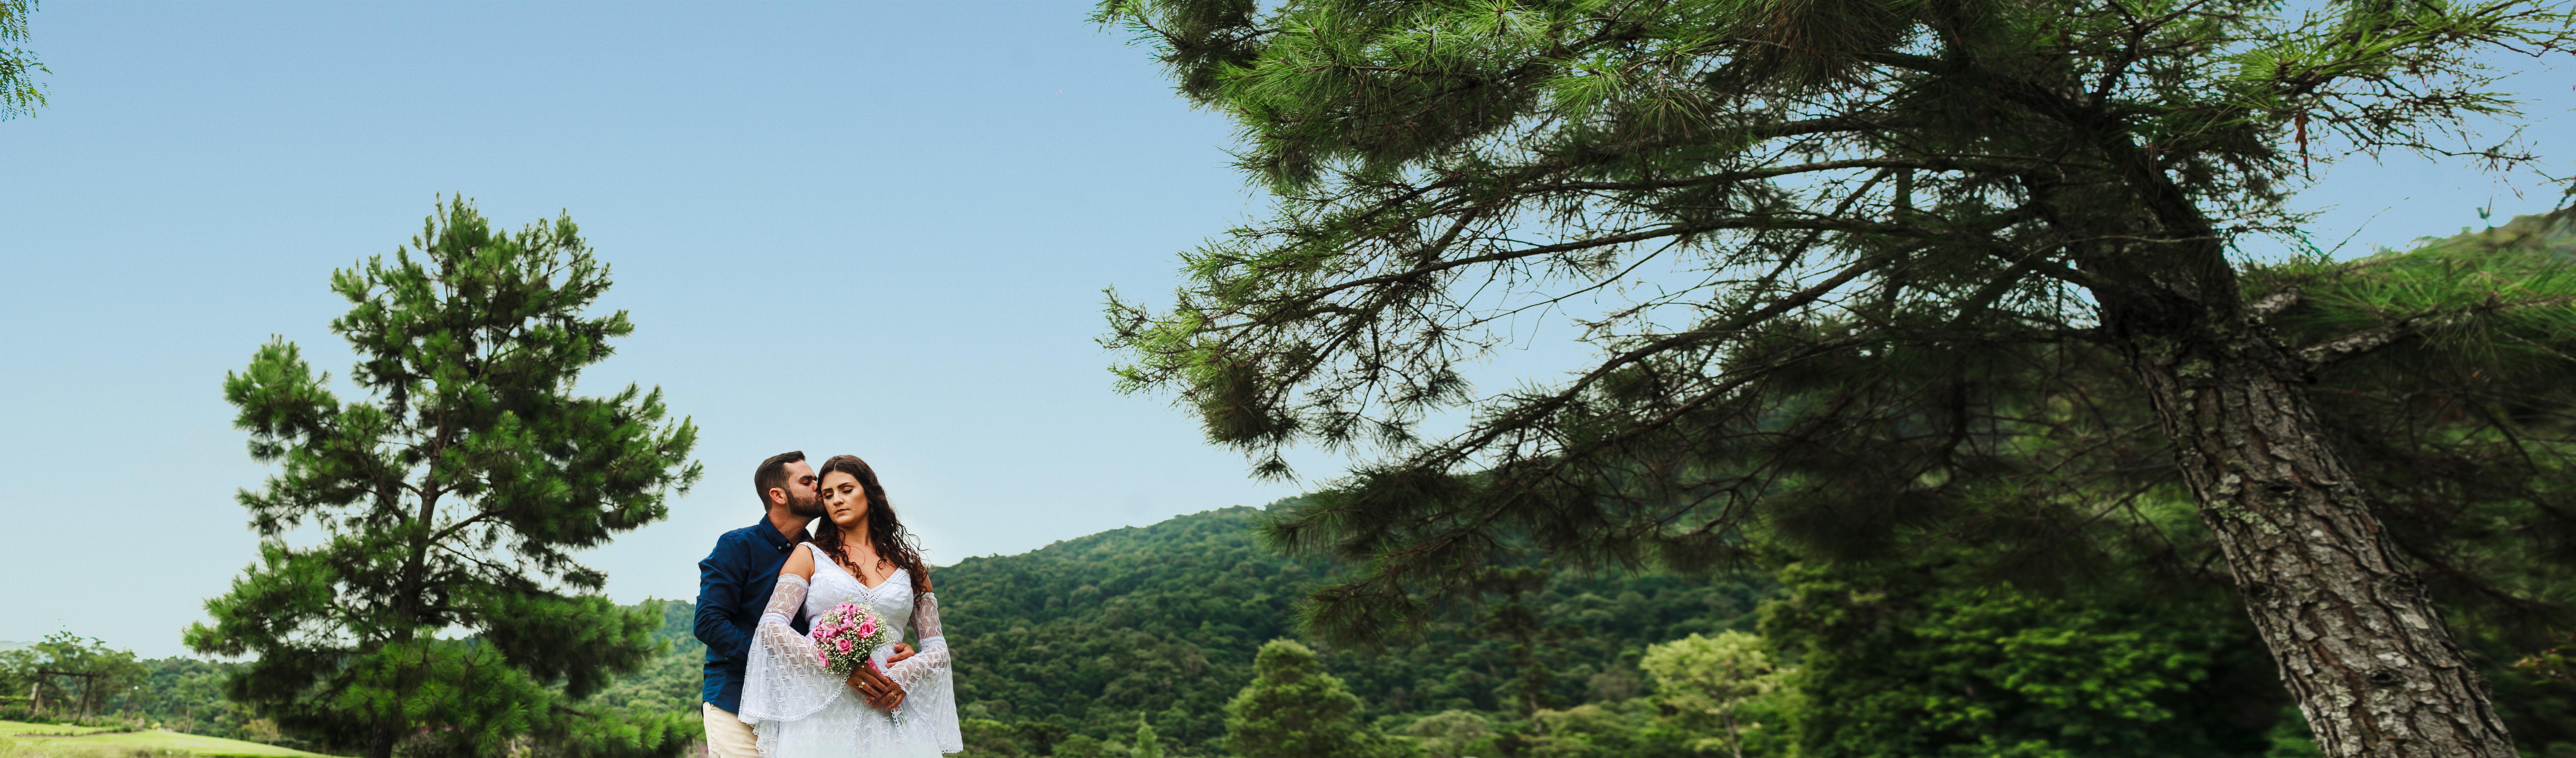 Contate Fotografo Itajai de Casamento, Ensaios Família, Ensaios de Casal, Fotos 15 anos e Estudio de Fotografia Itajai